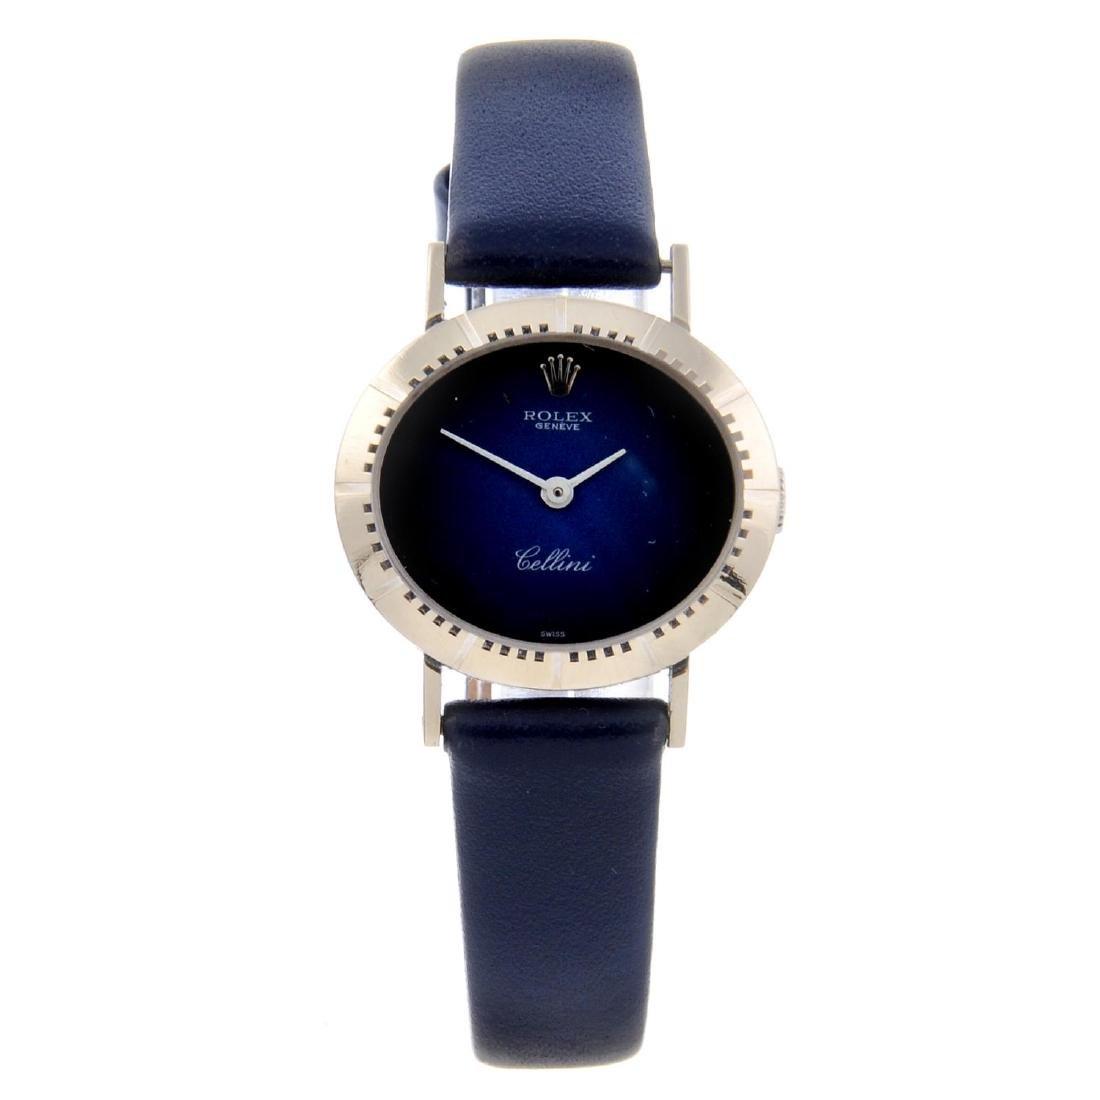 ROLEX - a lady's Cellini wrist watch. Circa 1981. 18ct